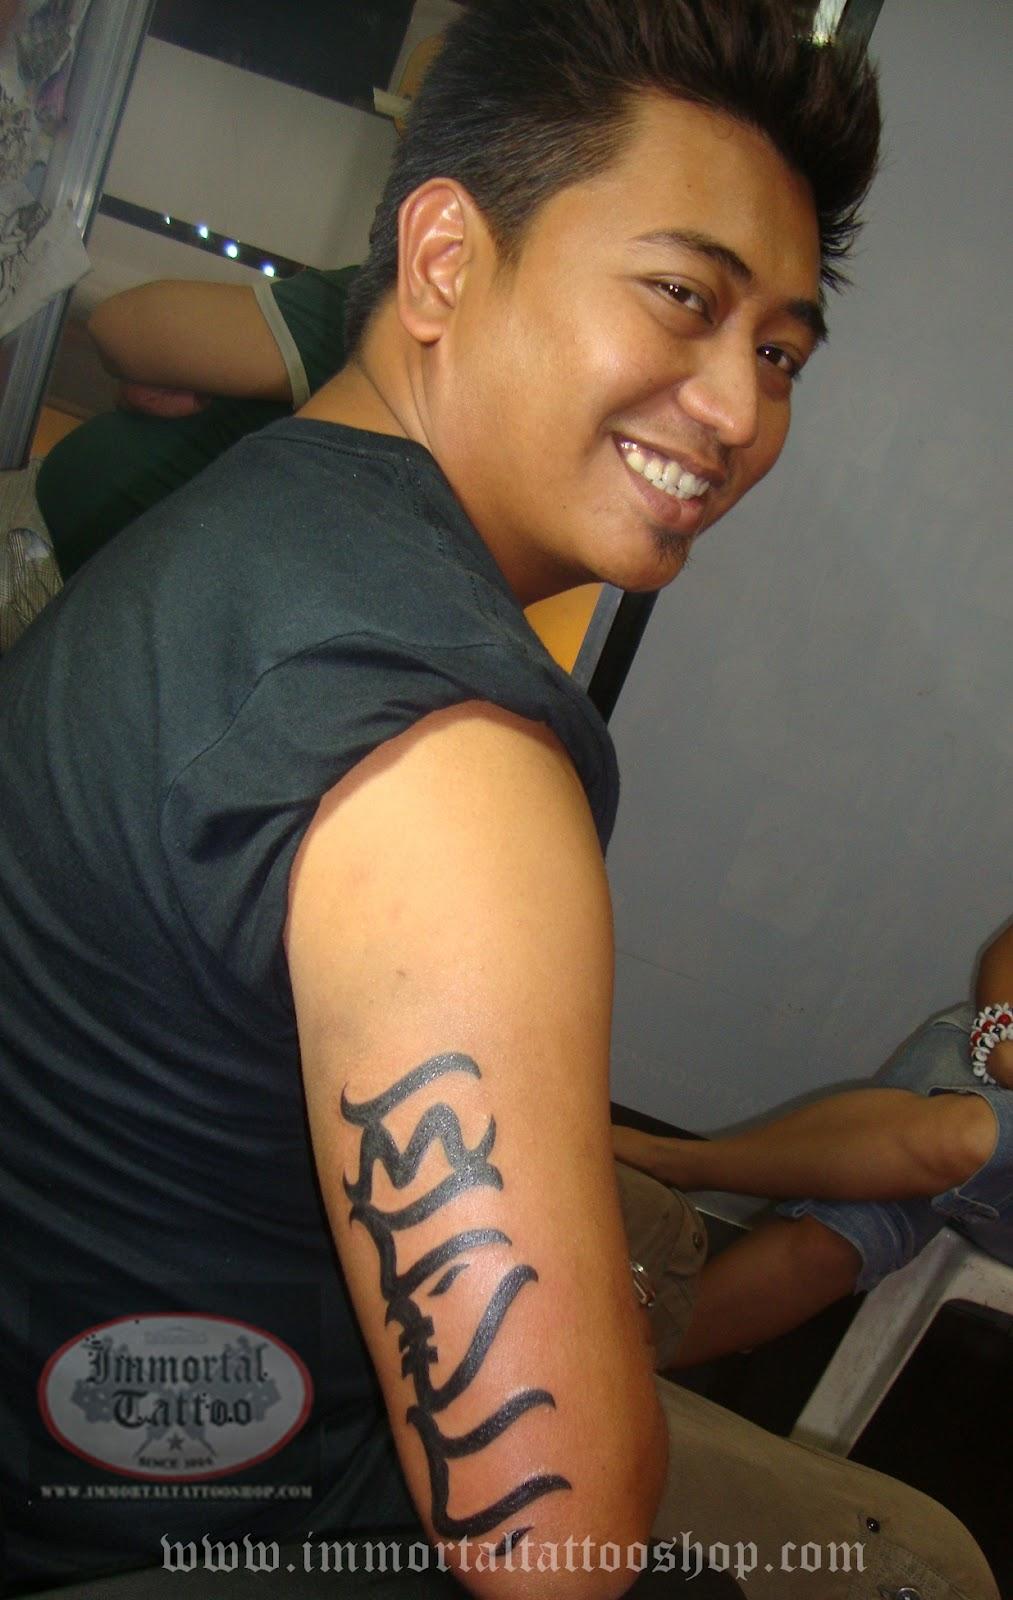 Filipinotattoo alibata filipino tattoo immortaltattoo for Philippine island tattoo